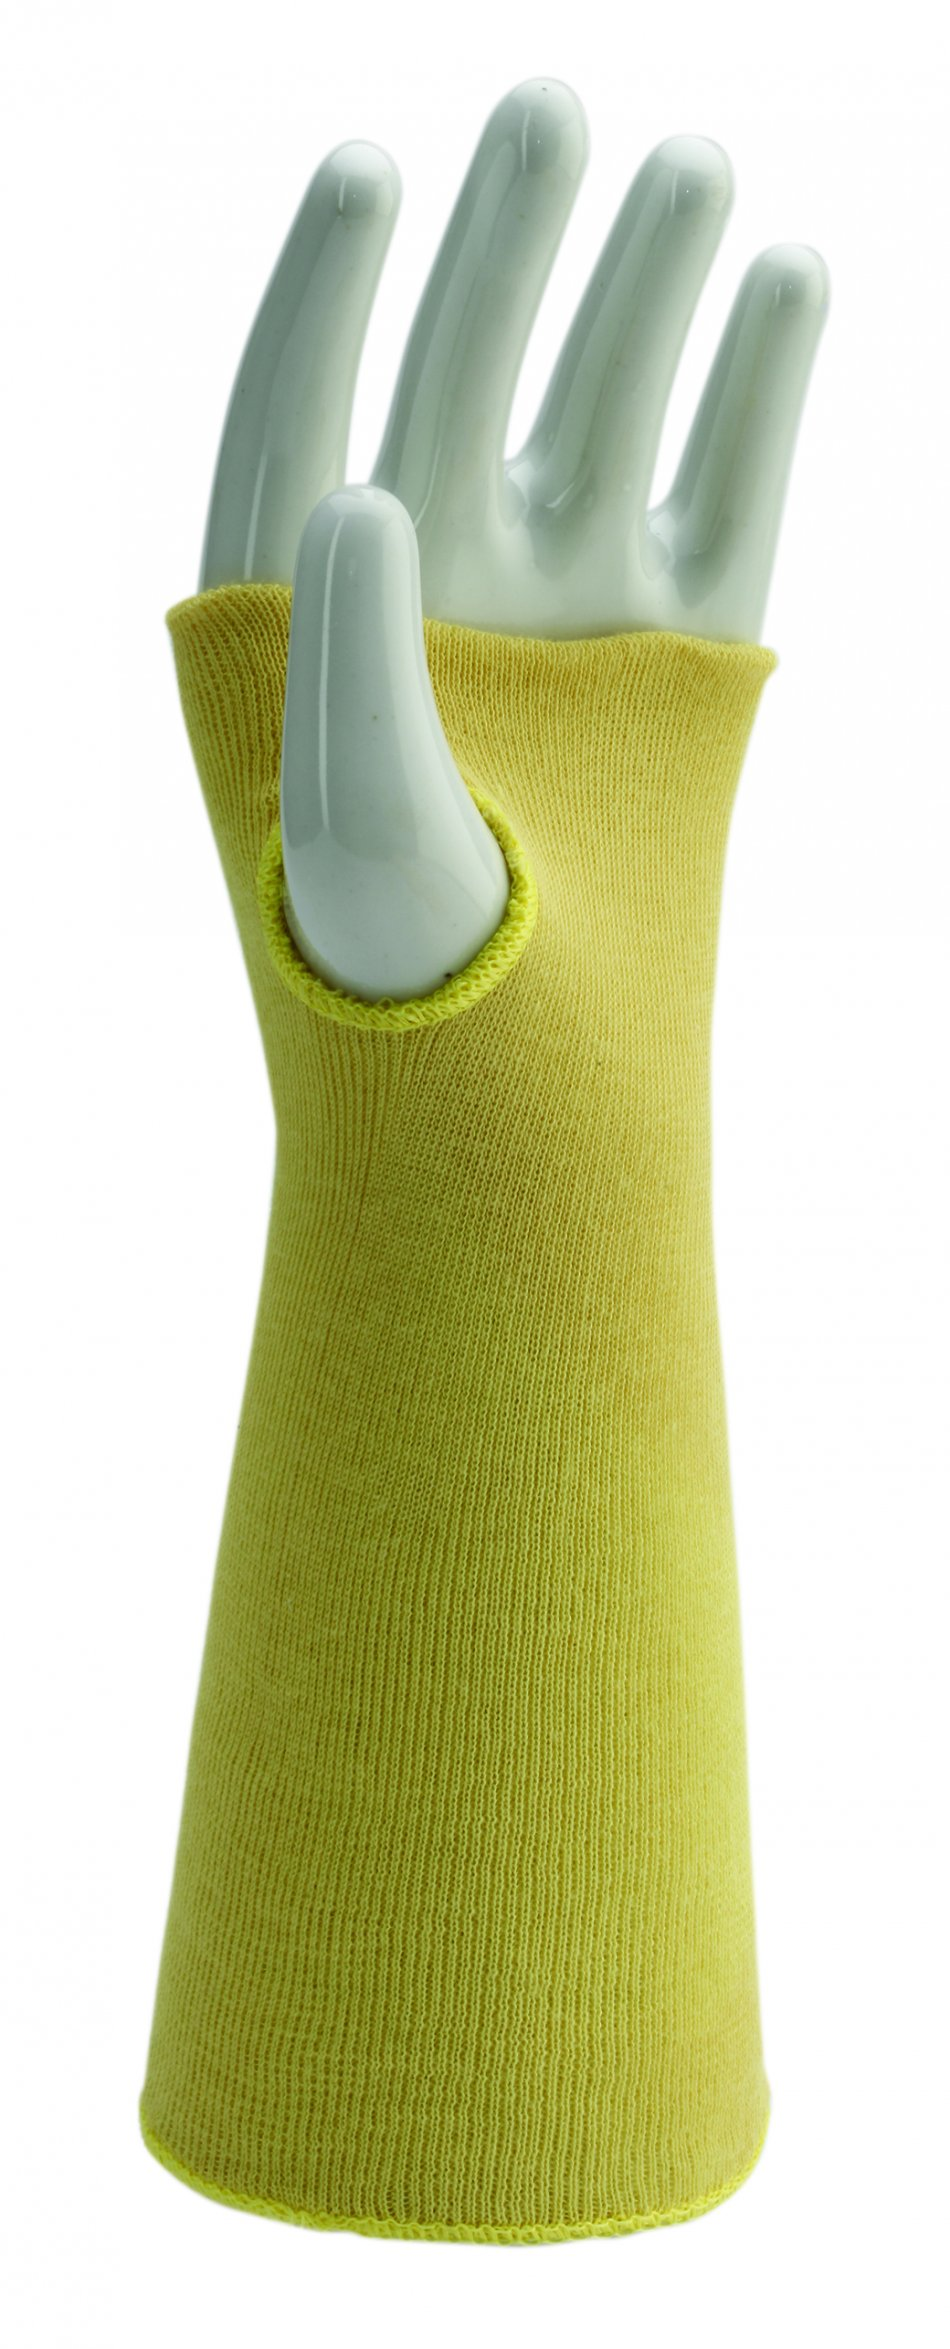 Protector kevlar pentru antebraţ,10 cm